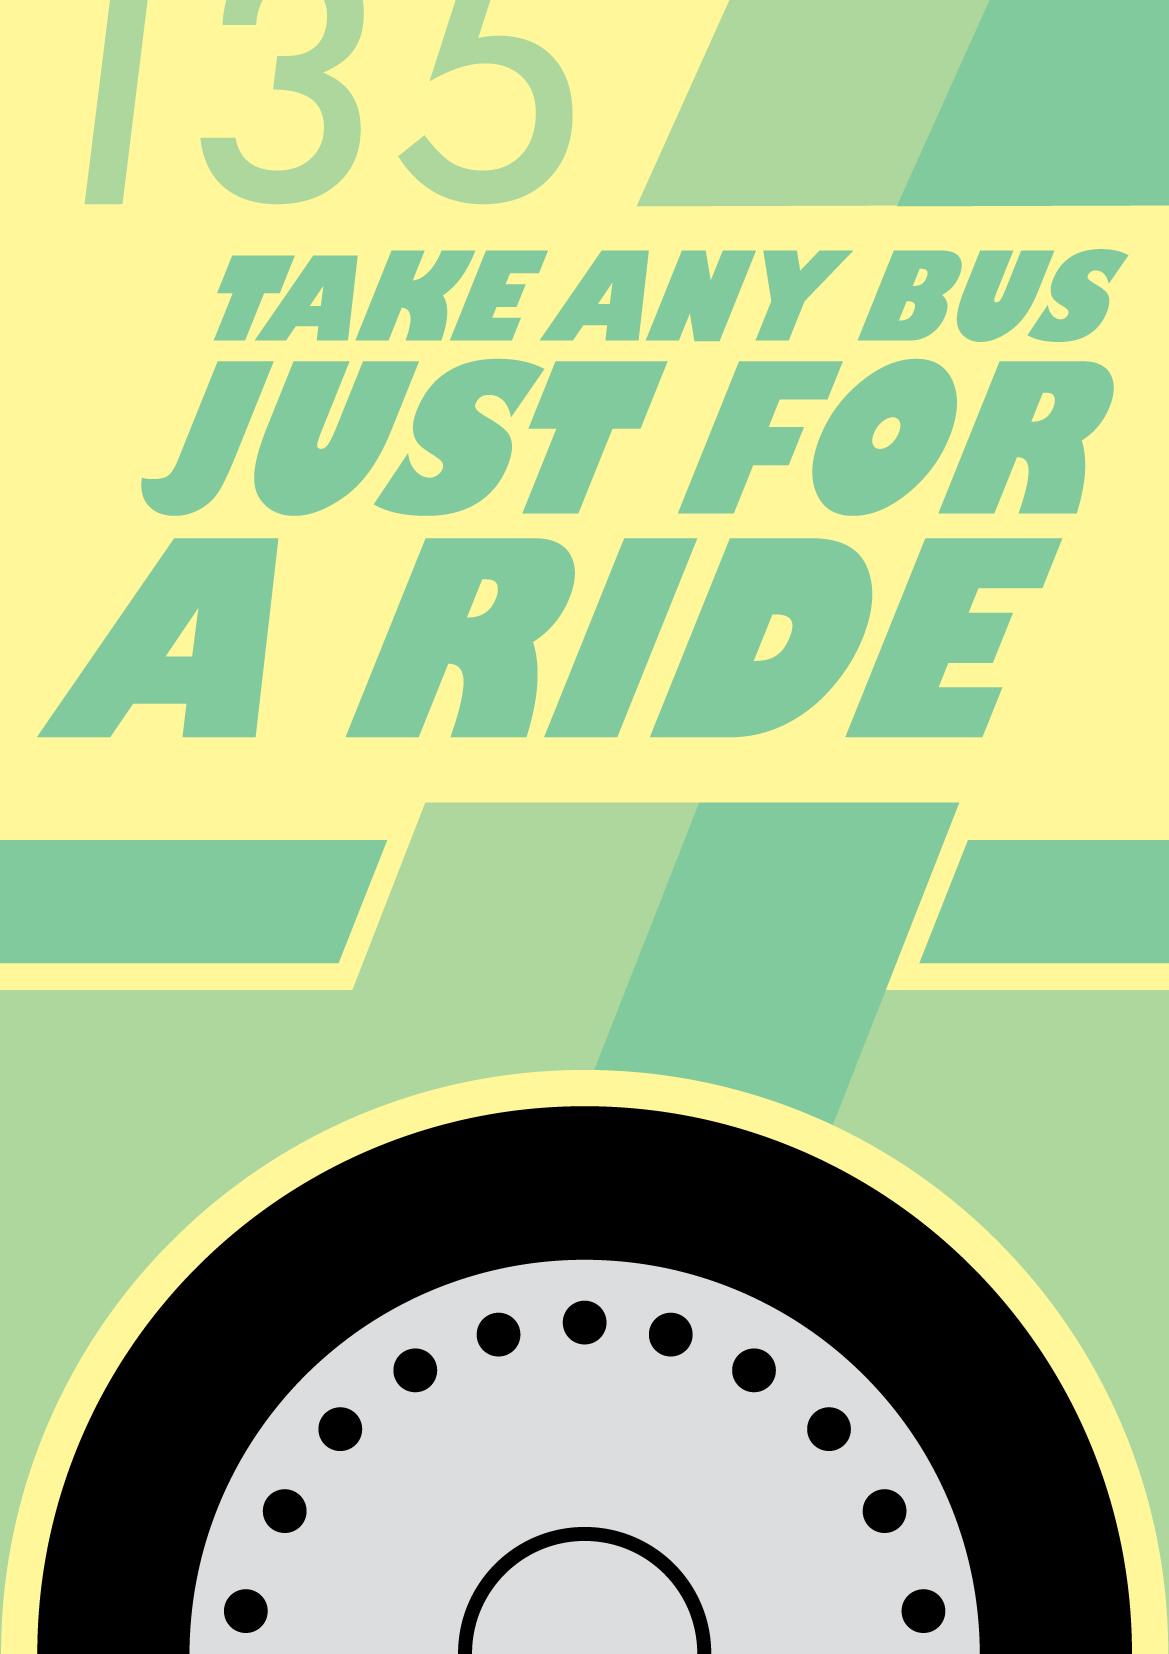 Bus ride.jpg